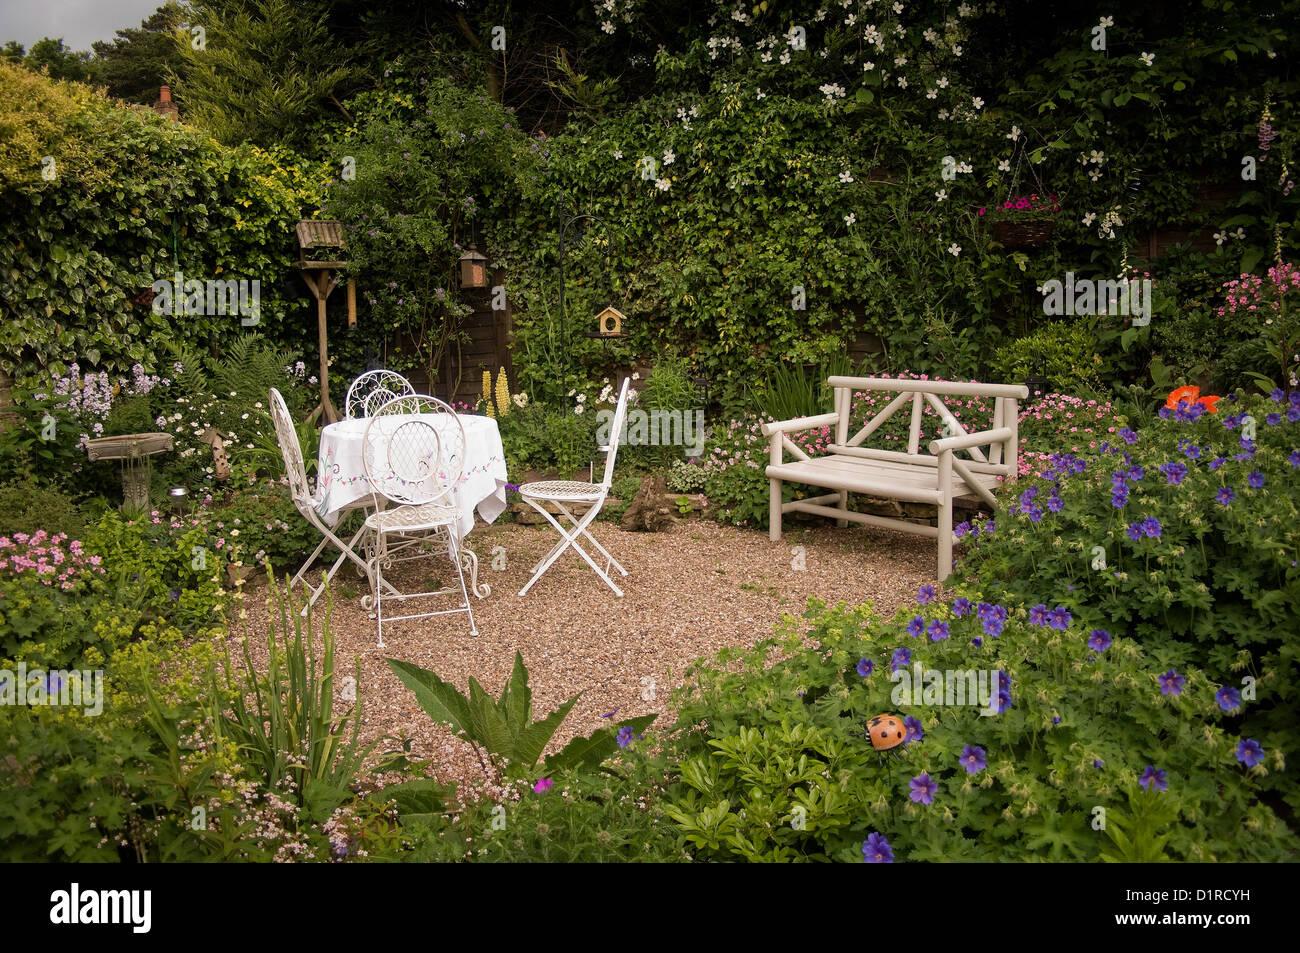 English Cottage Garden Stock Photo: 52760837 - Alamy